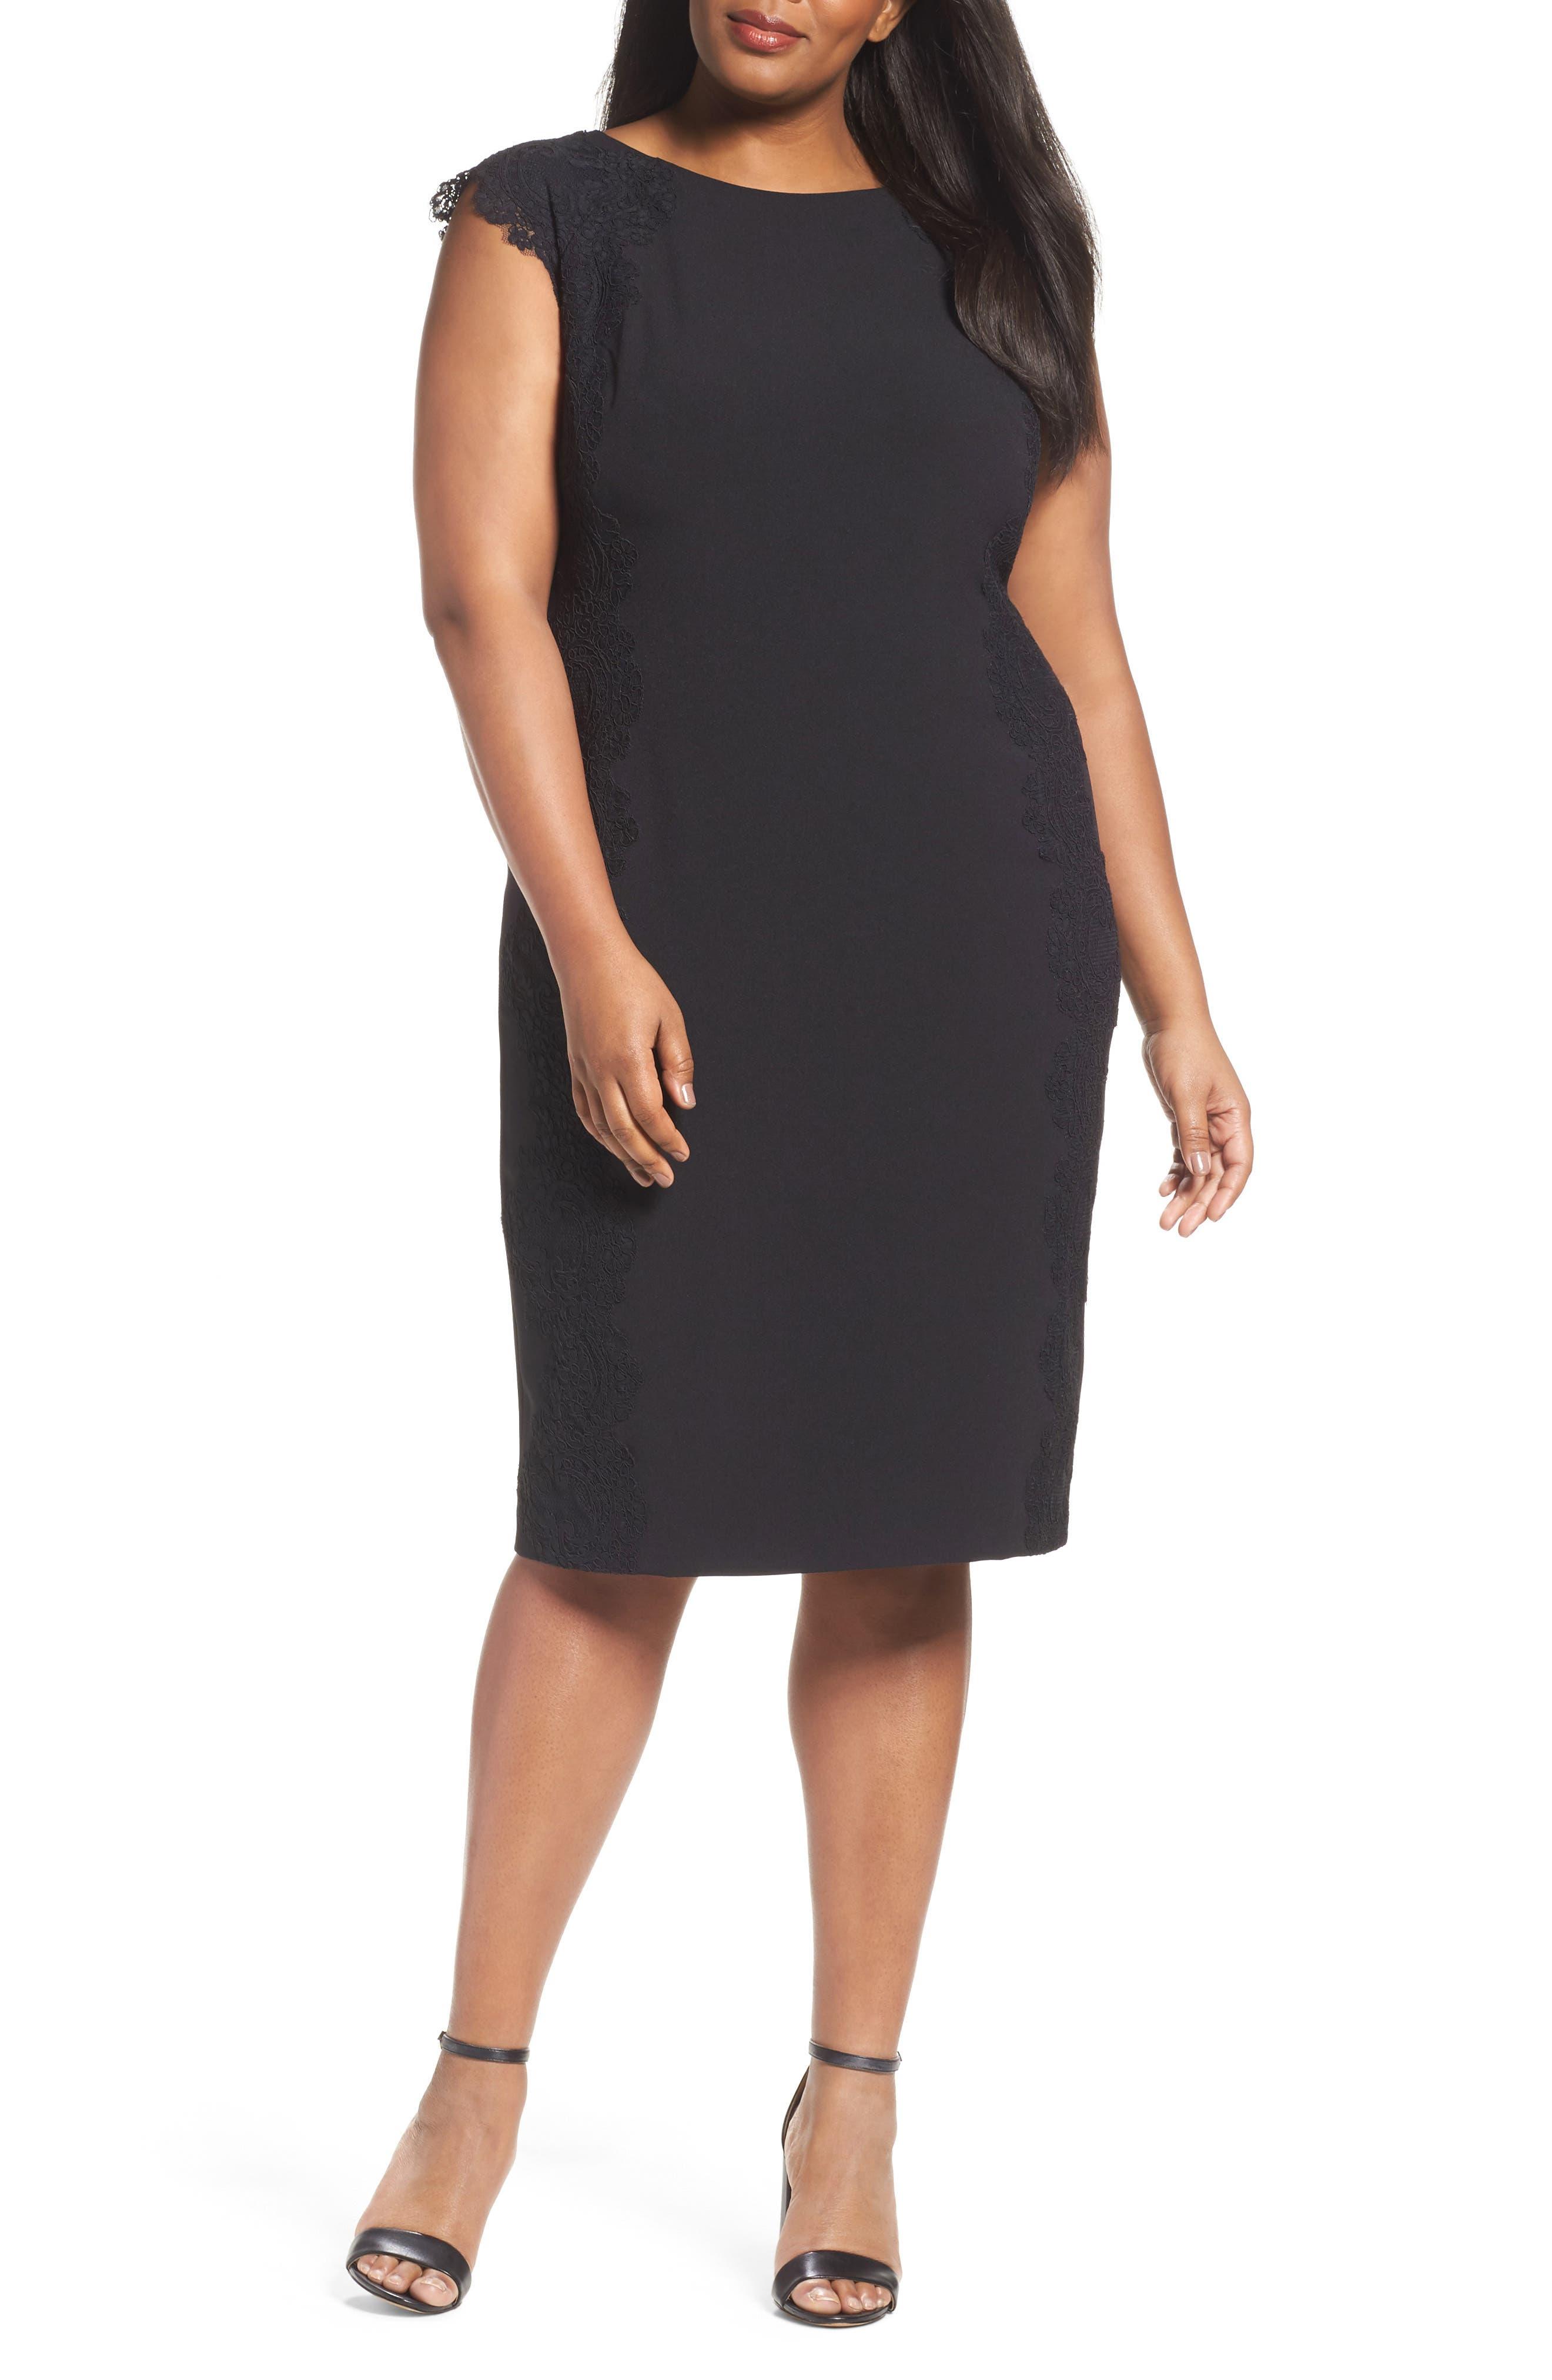 Maggy london black cocktail dress